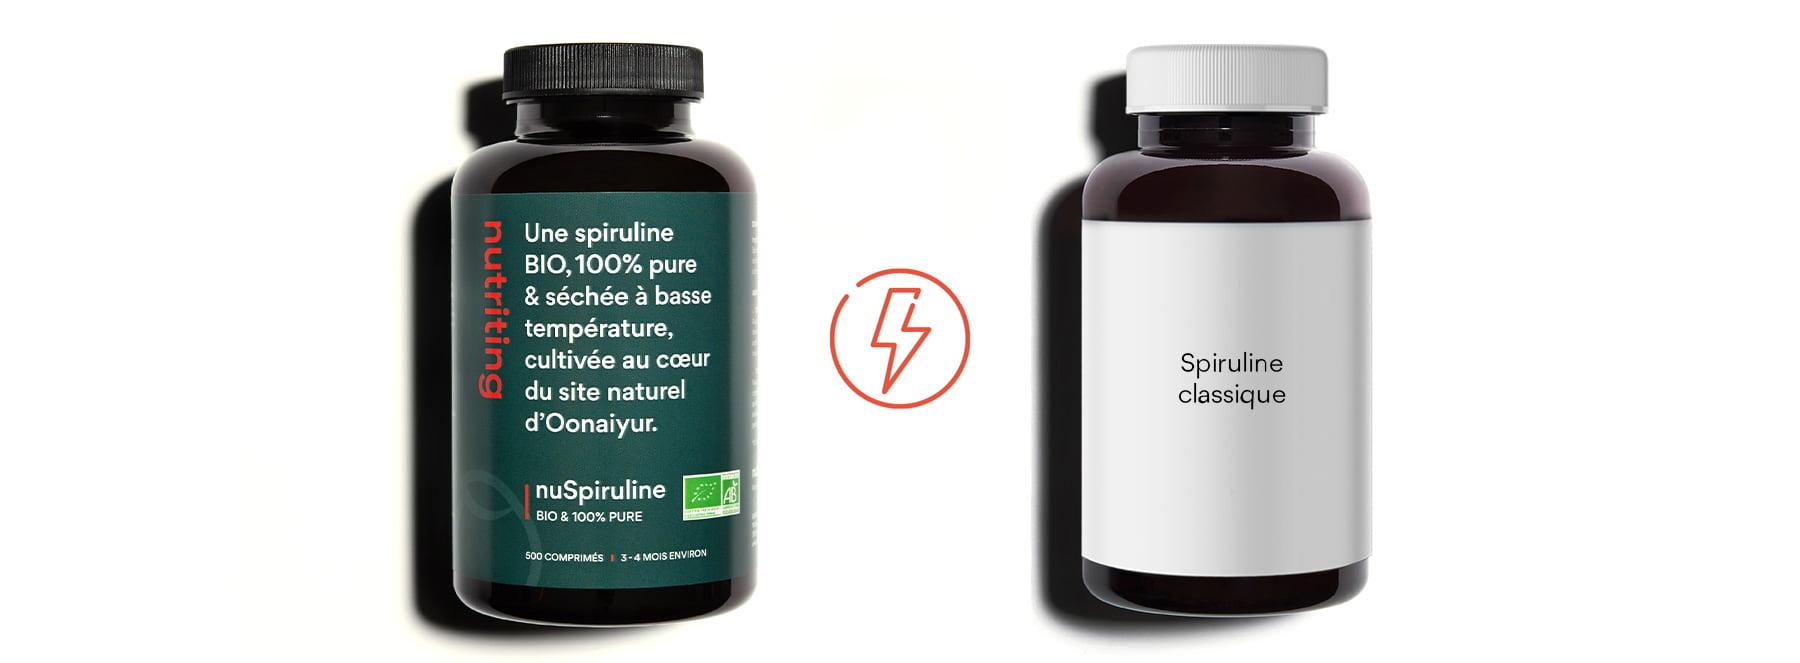 nuSpiruline_versus